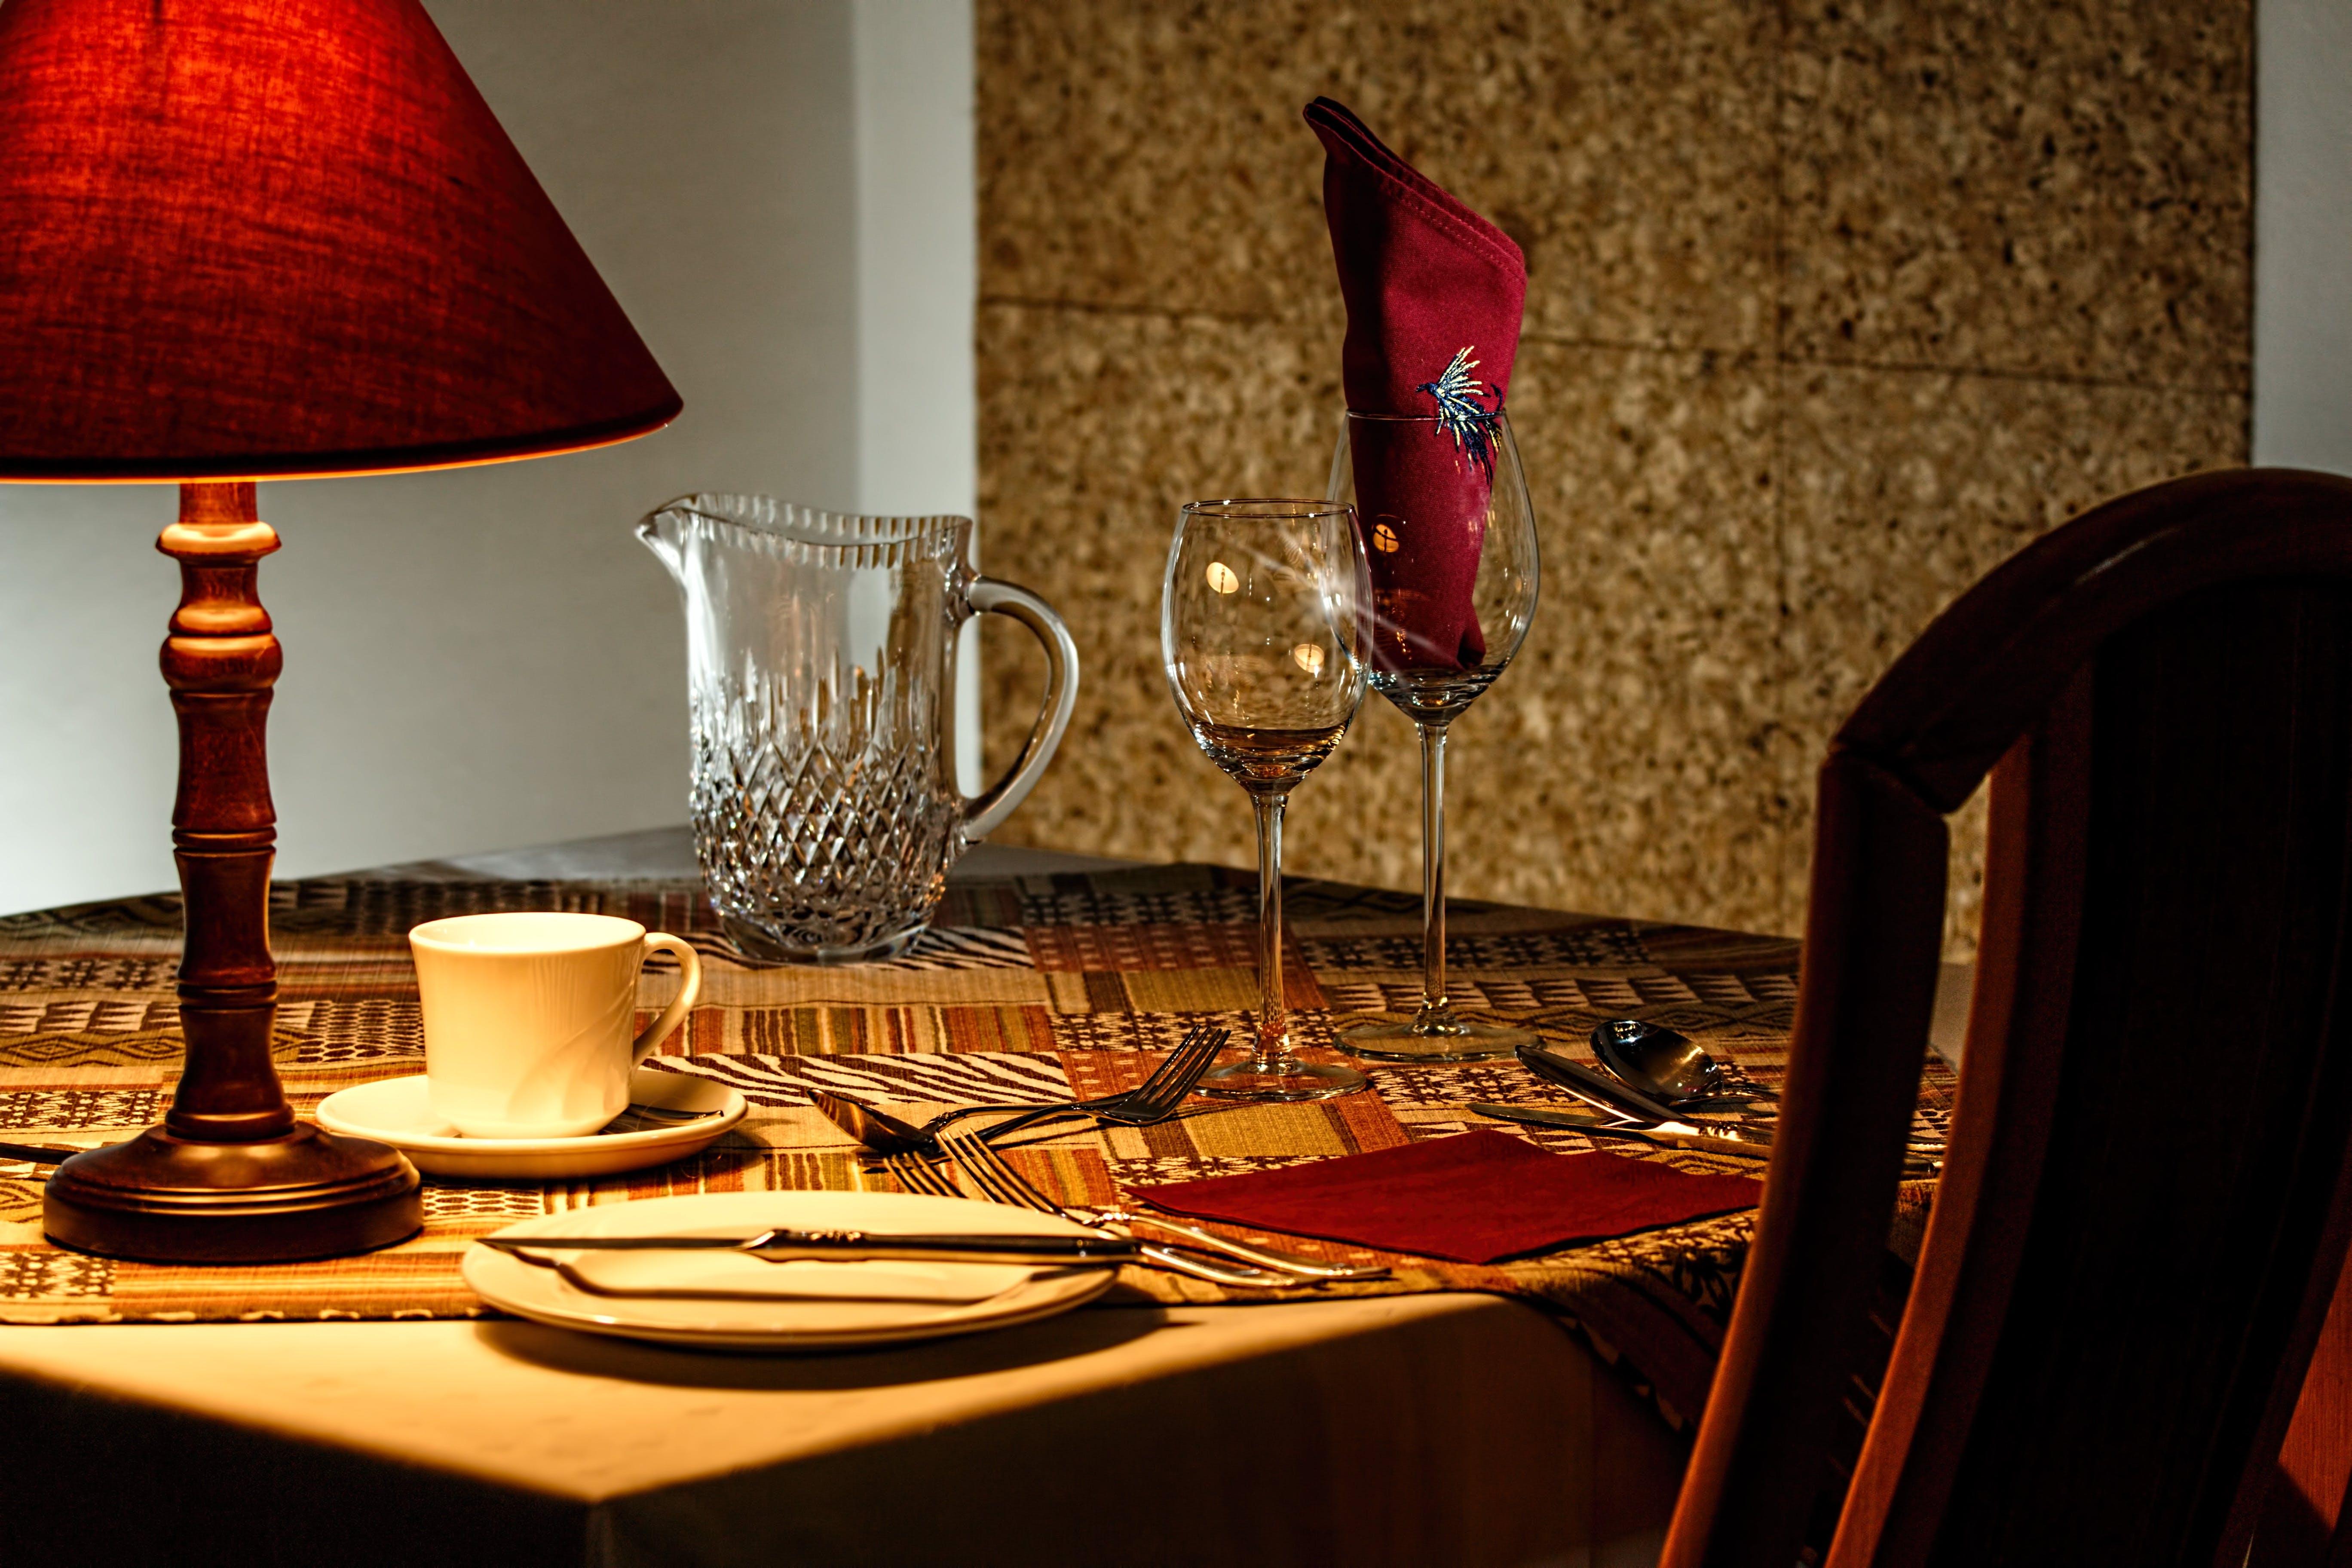 Brown and Red Table Lamp Near White Ceramic Mug